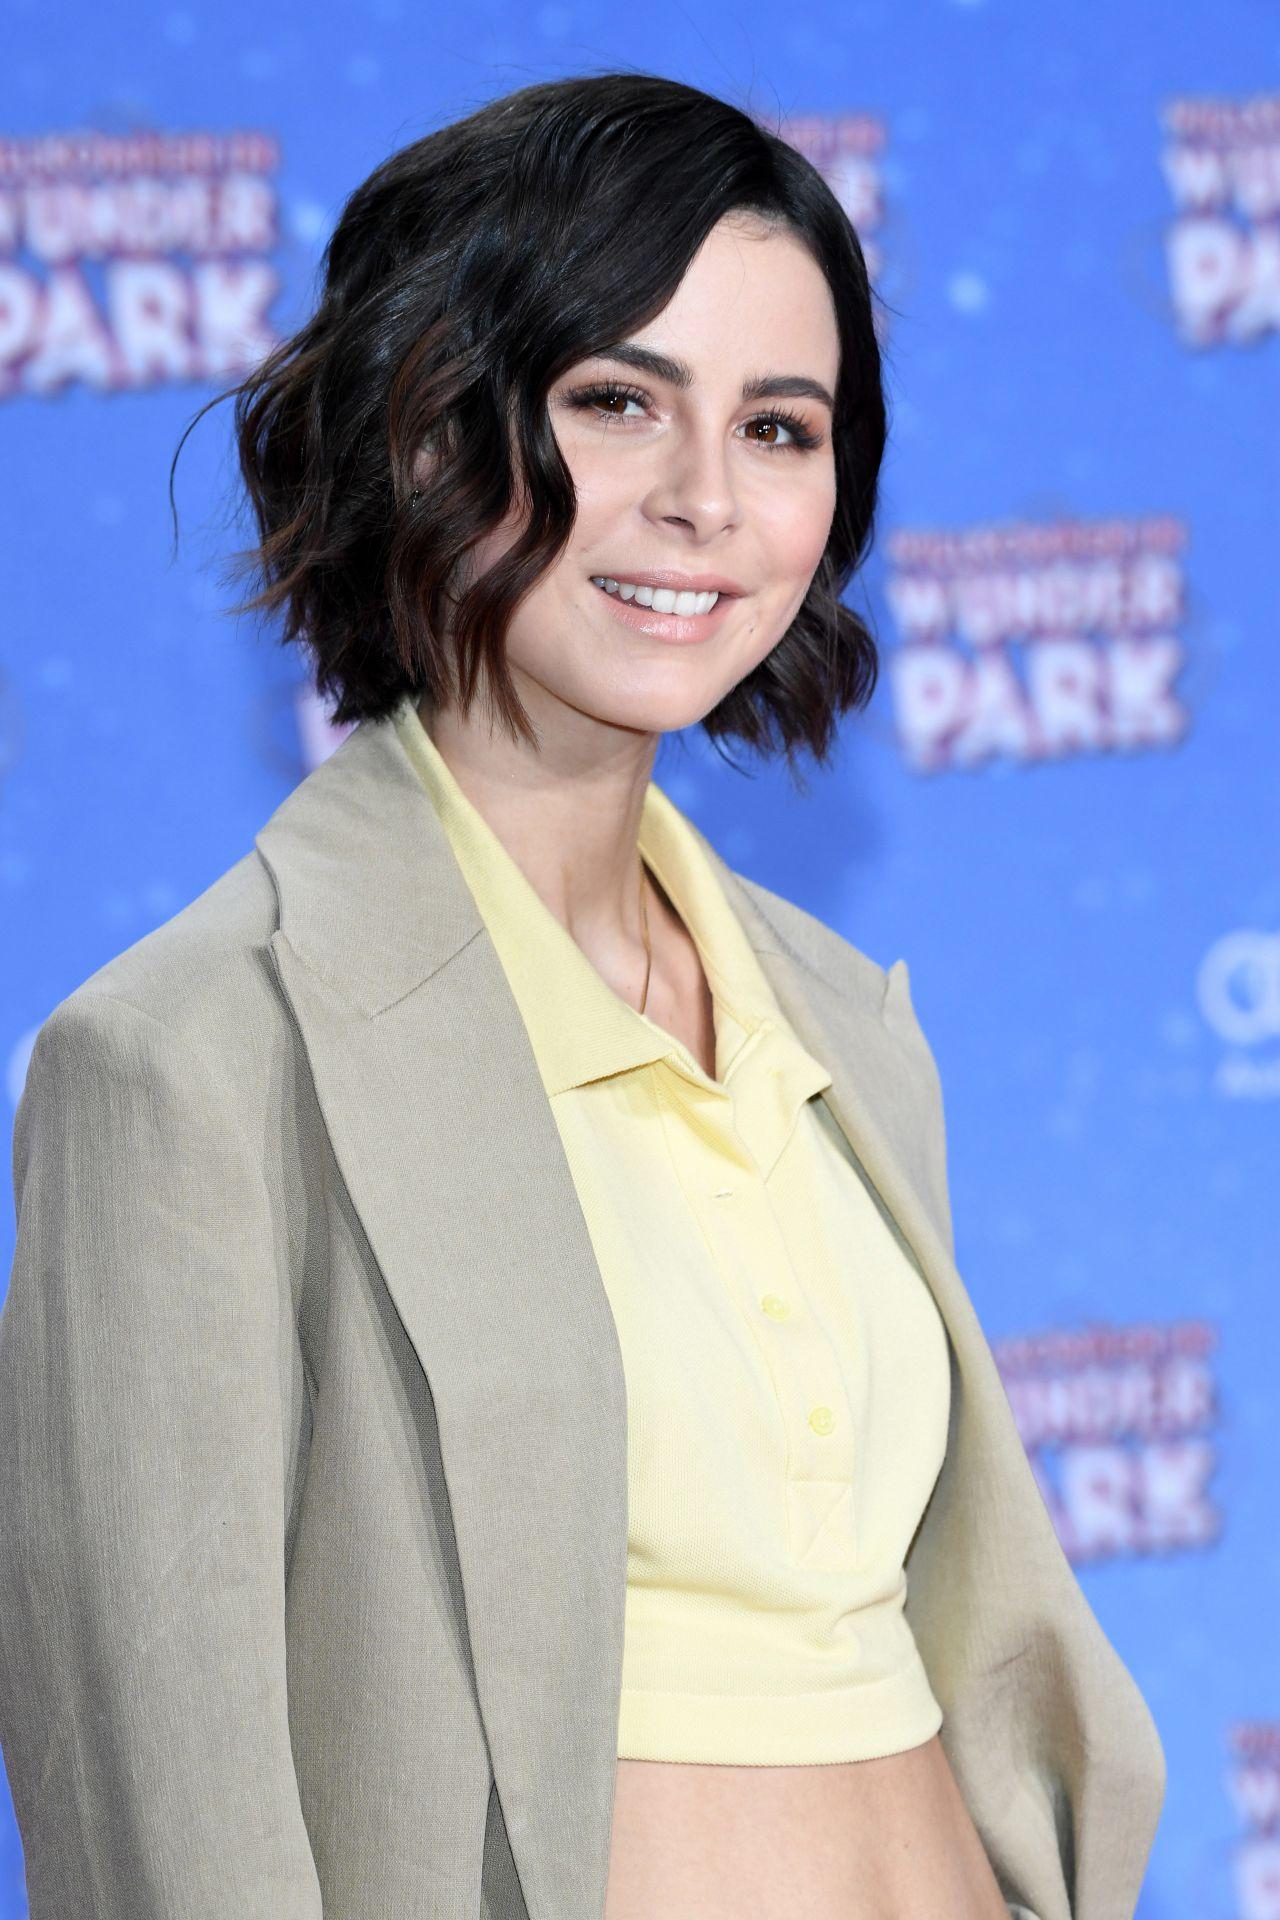 Lena Meyer Landrut U0026quot Willkommen Im Wunder Park U0026quot Premiere